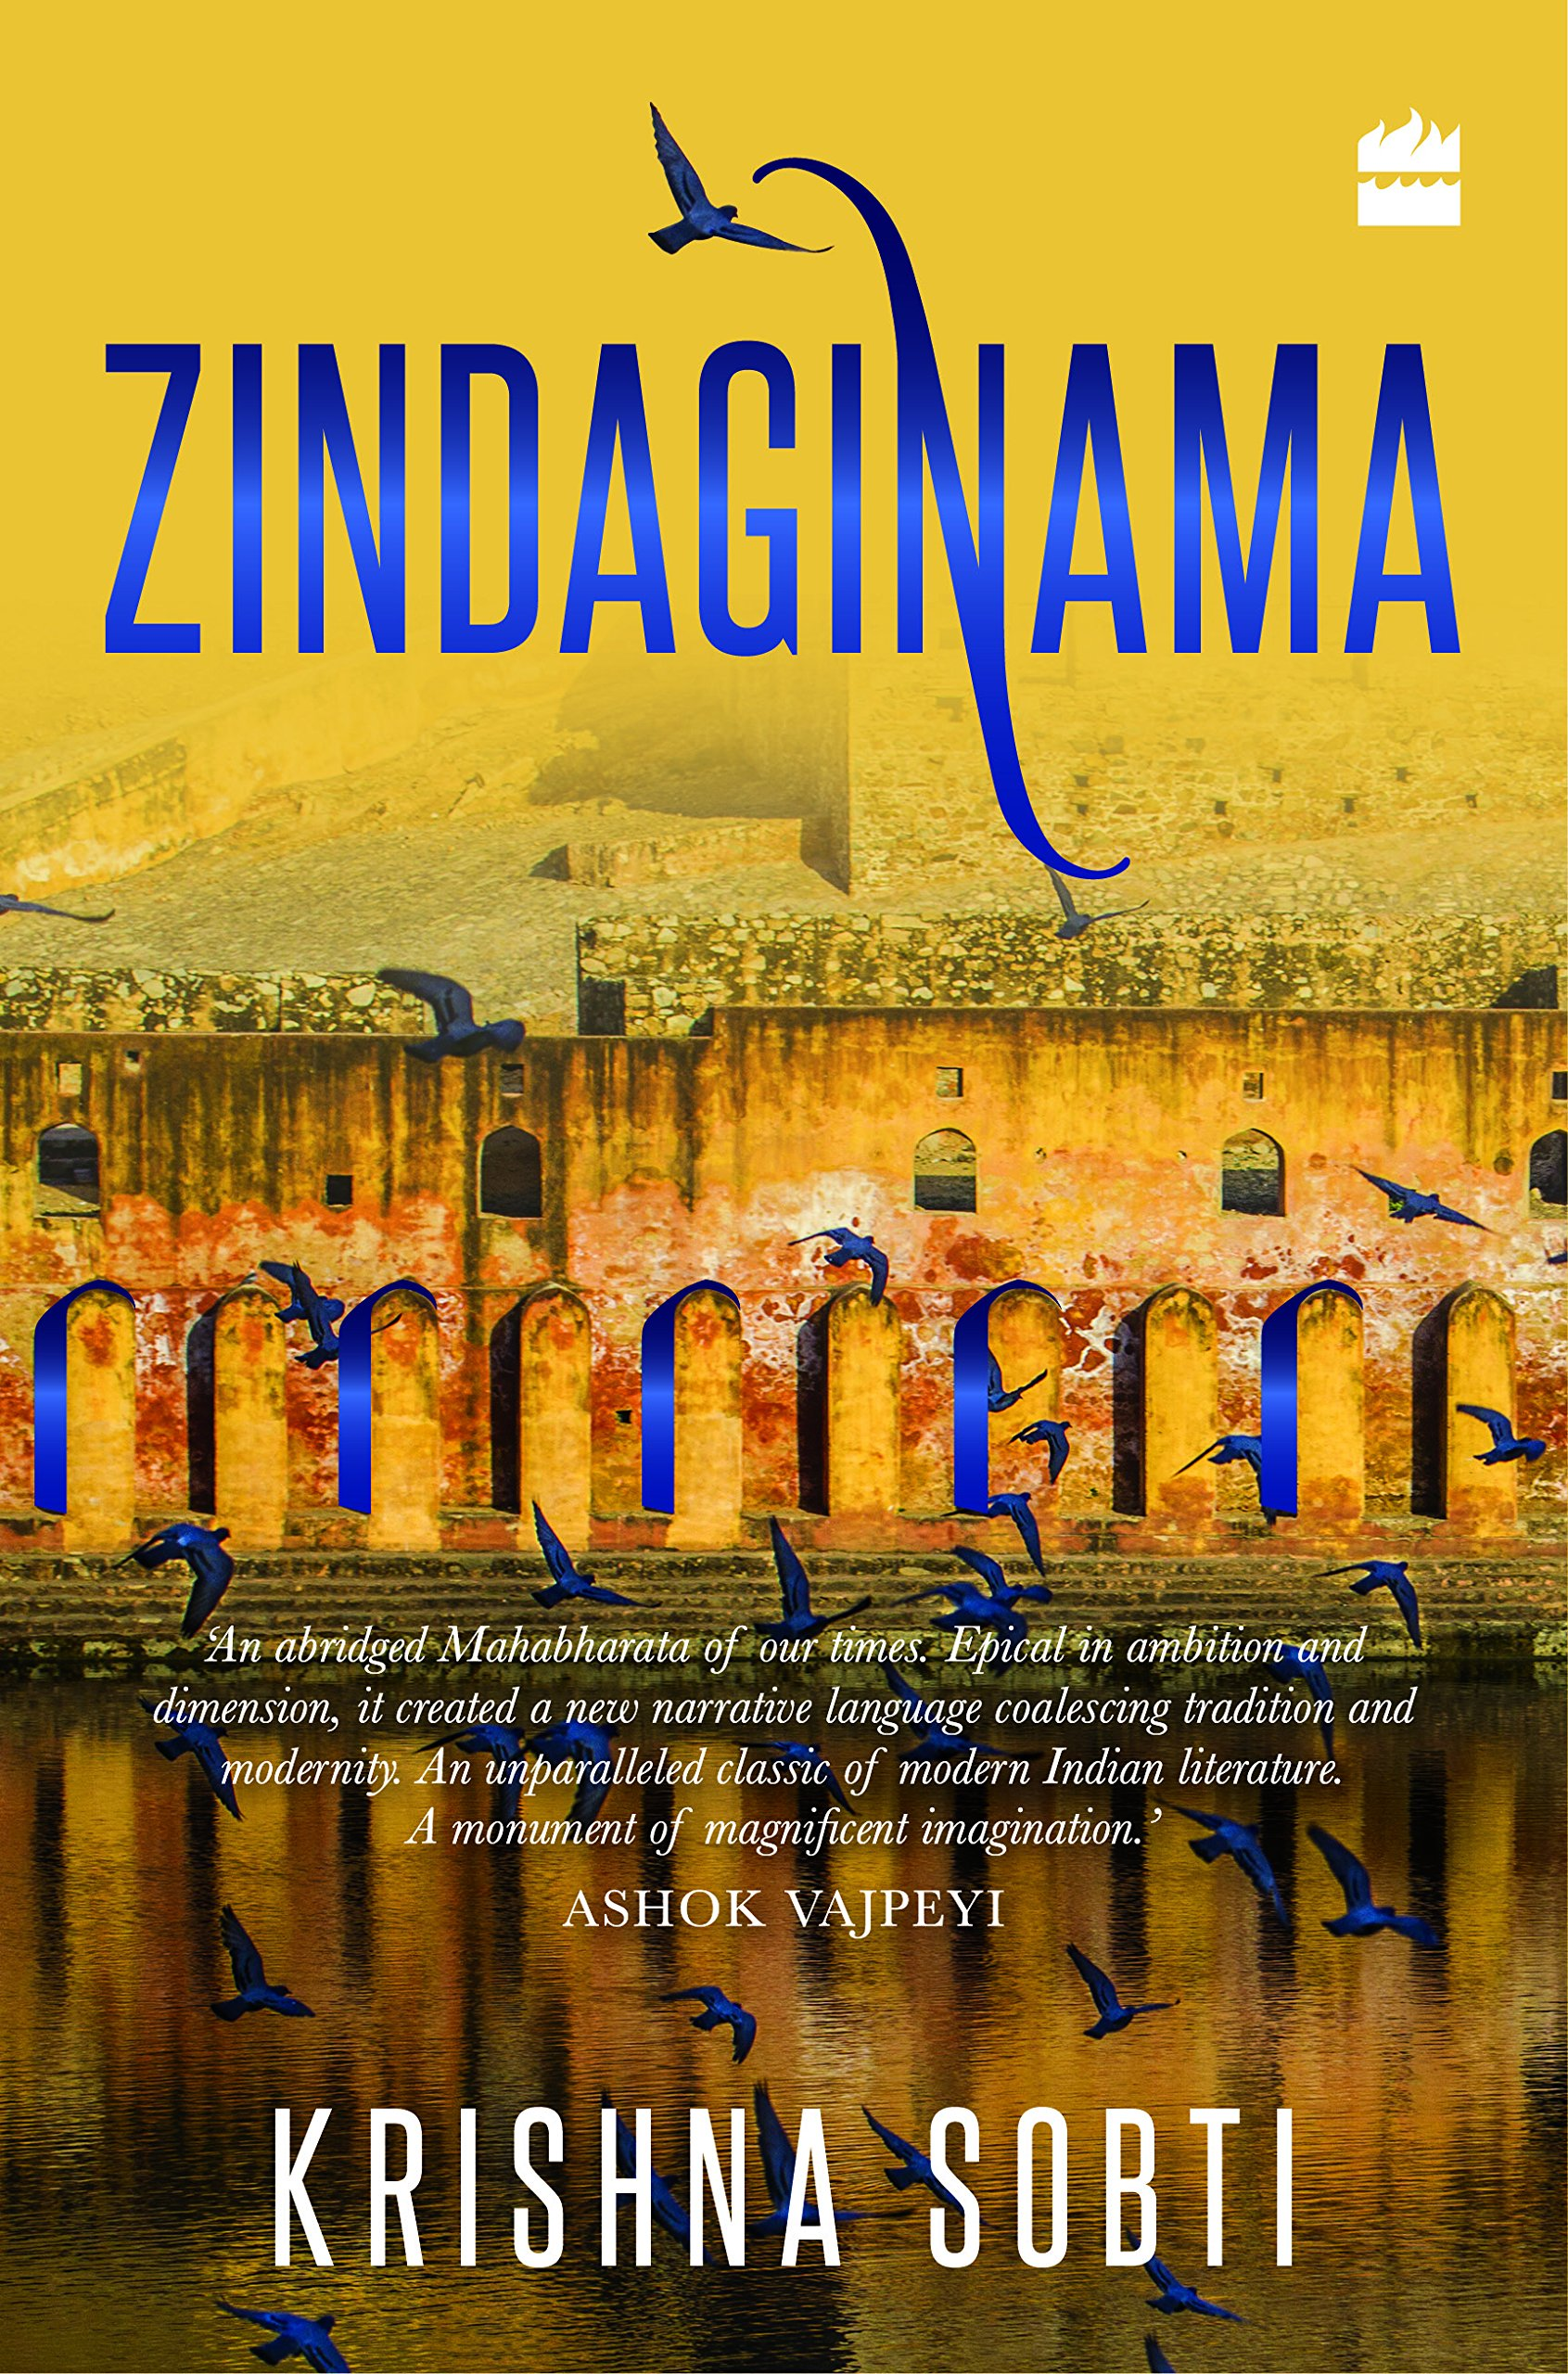 Image result for zindaginama